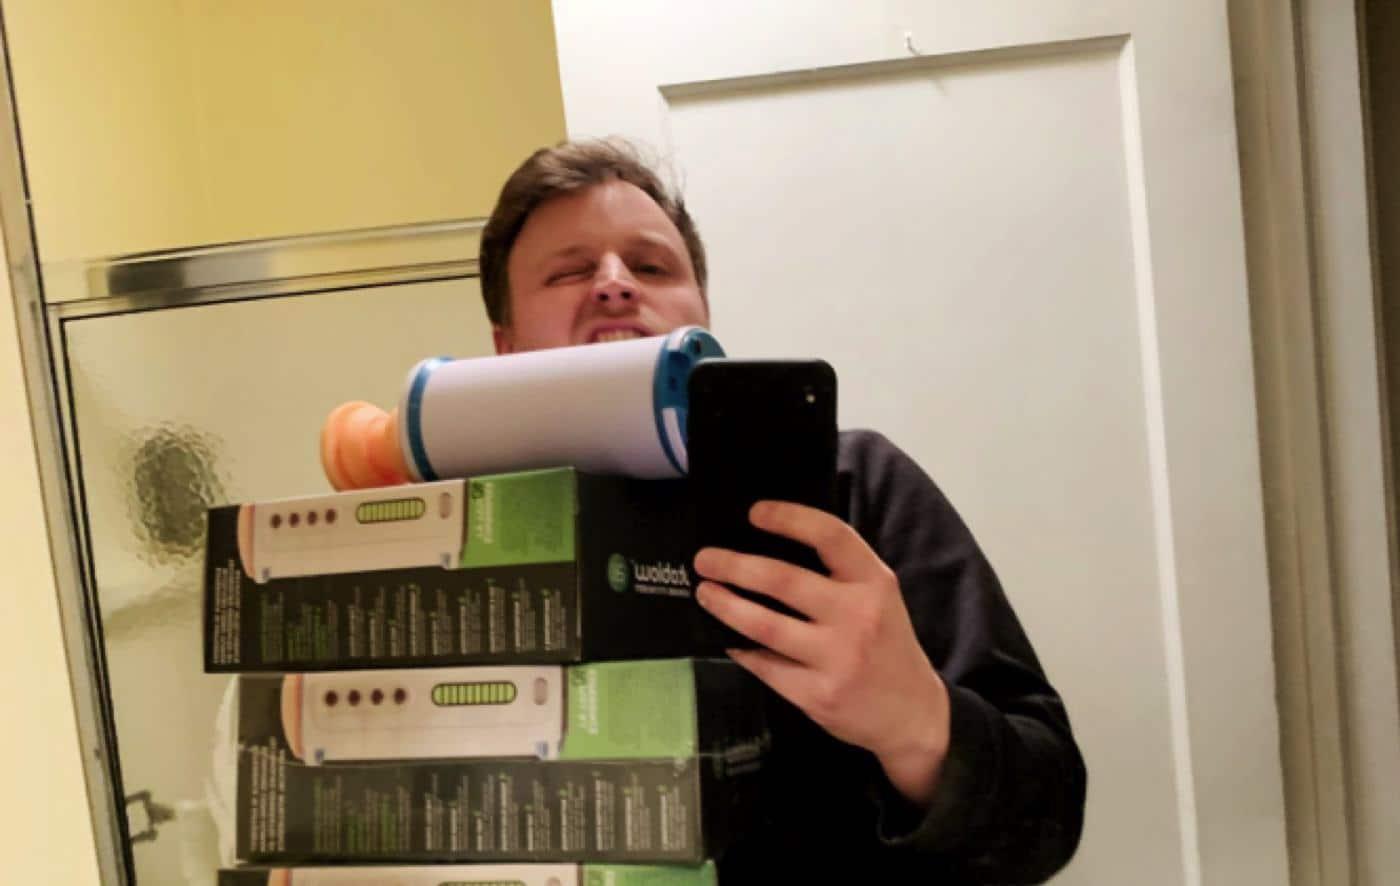 josiah blowjob machines